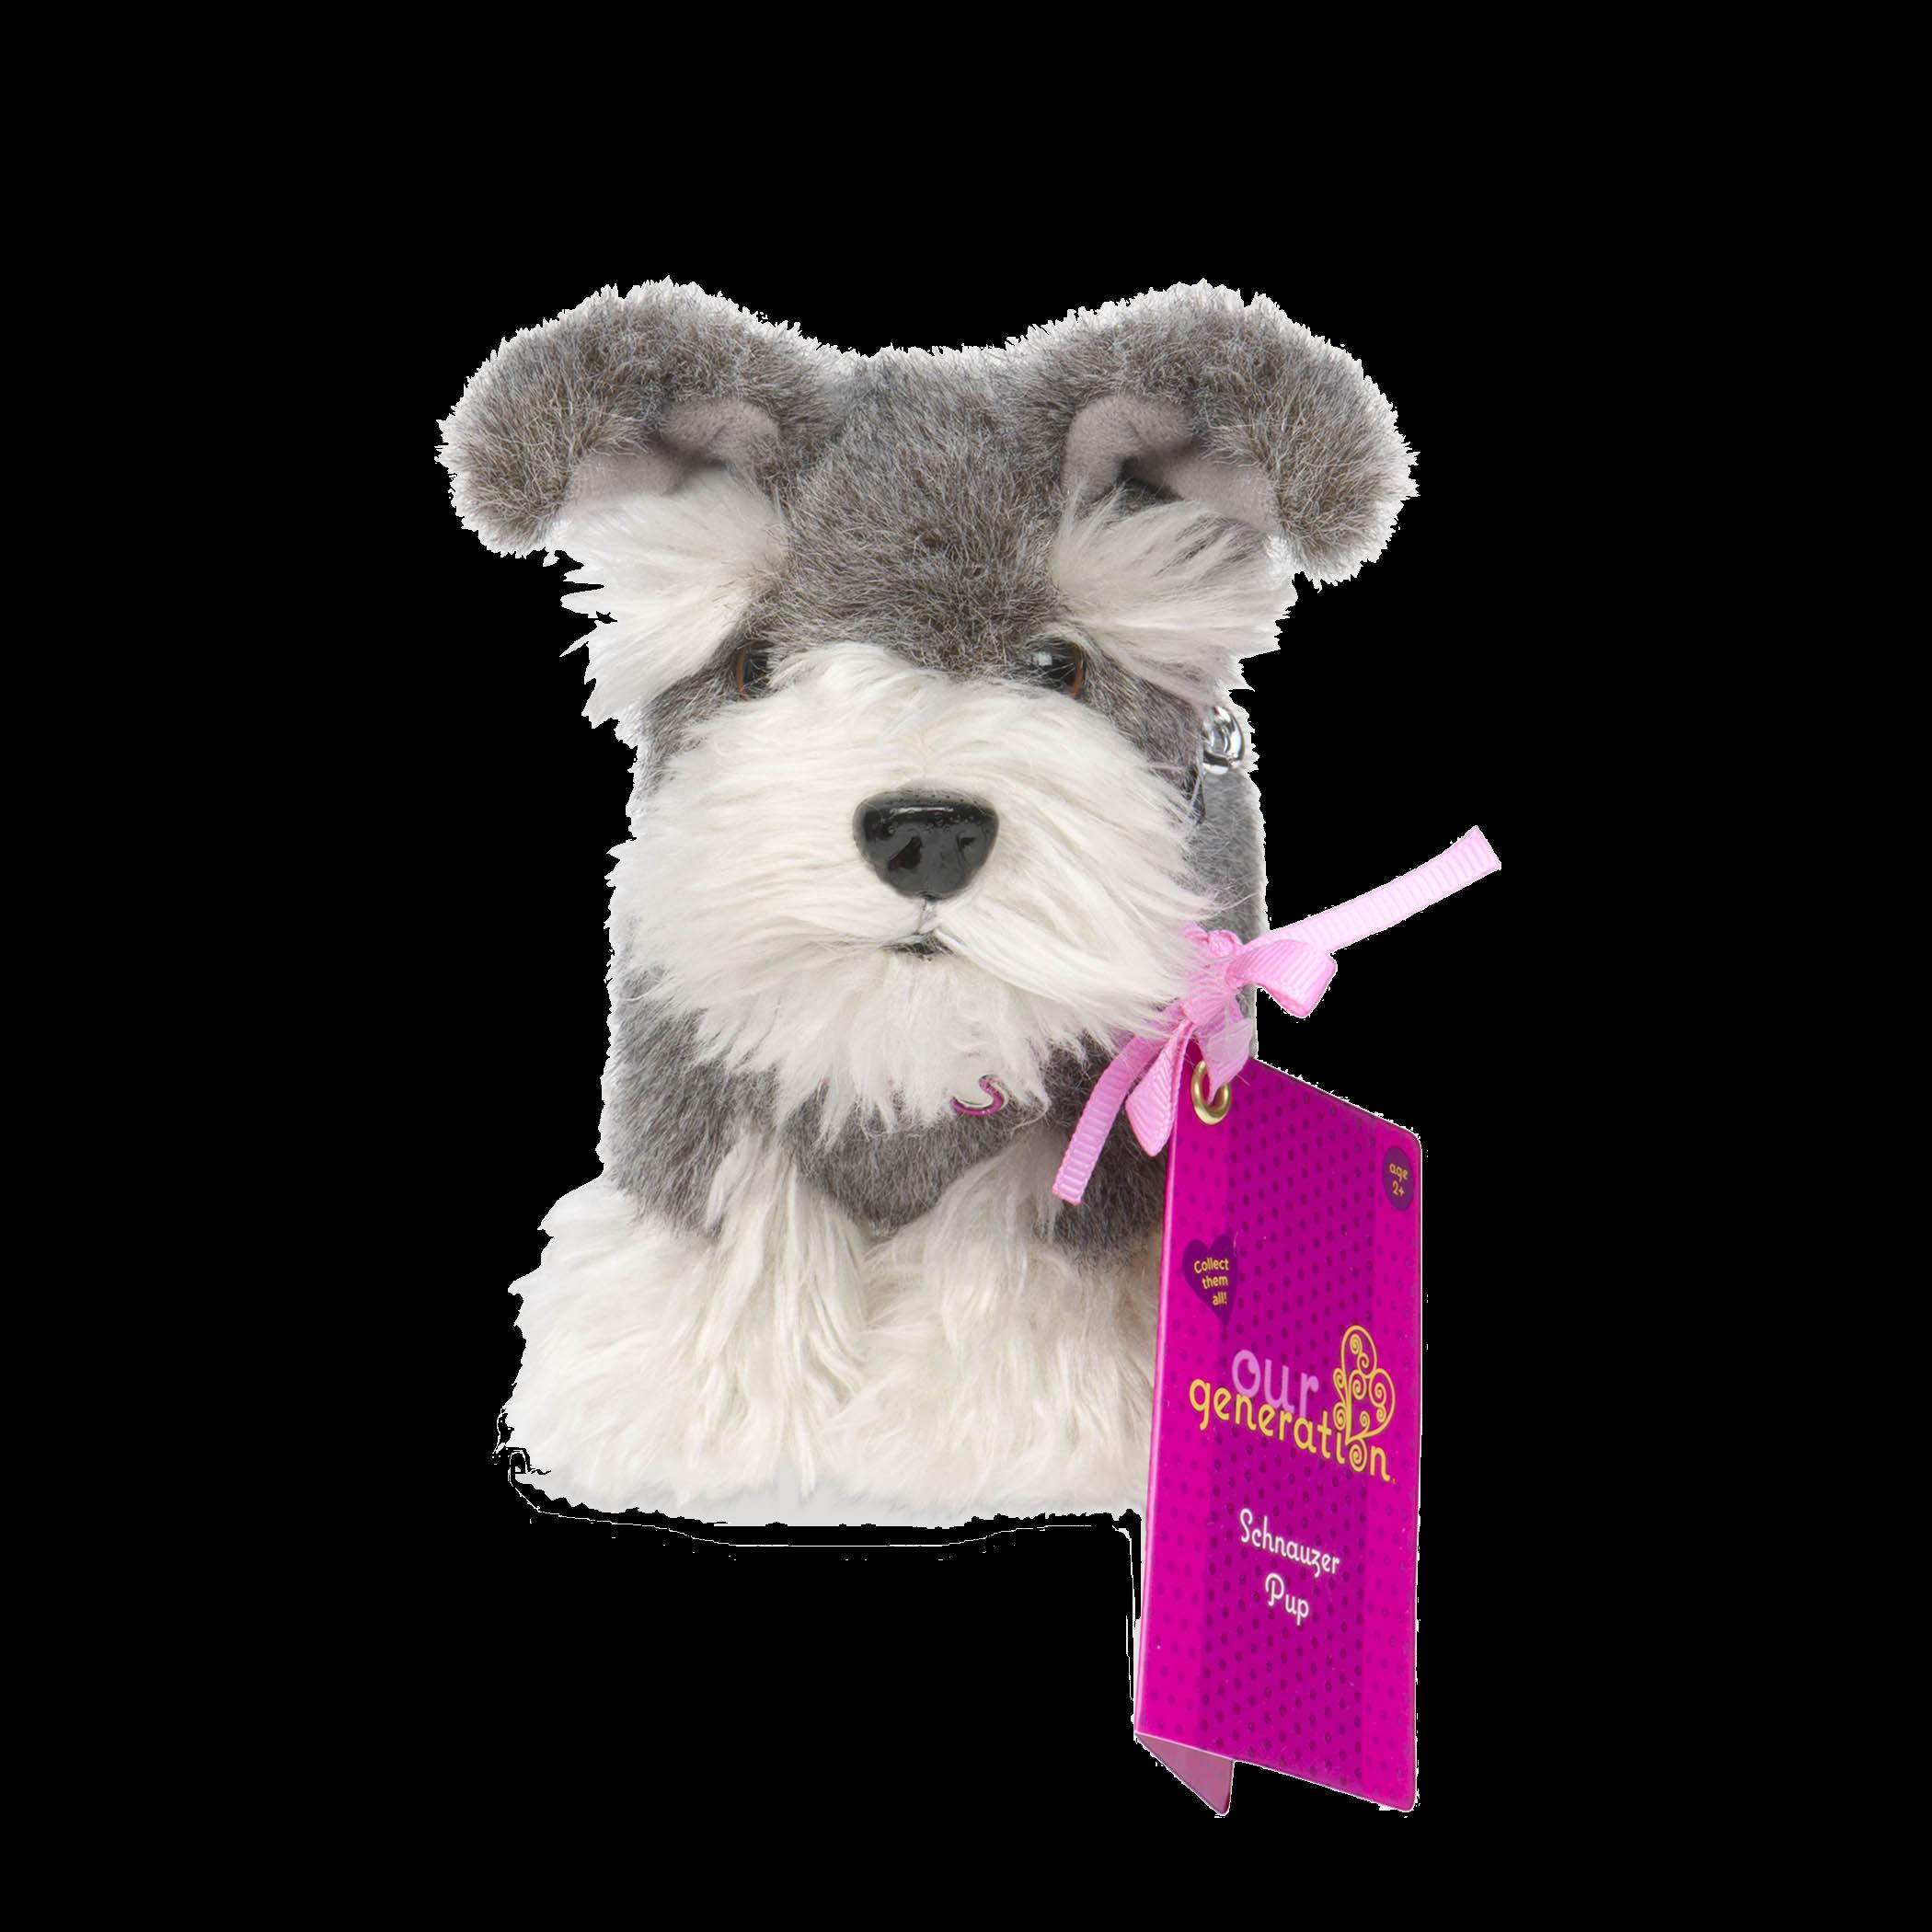 Schnauzer pup package01